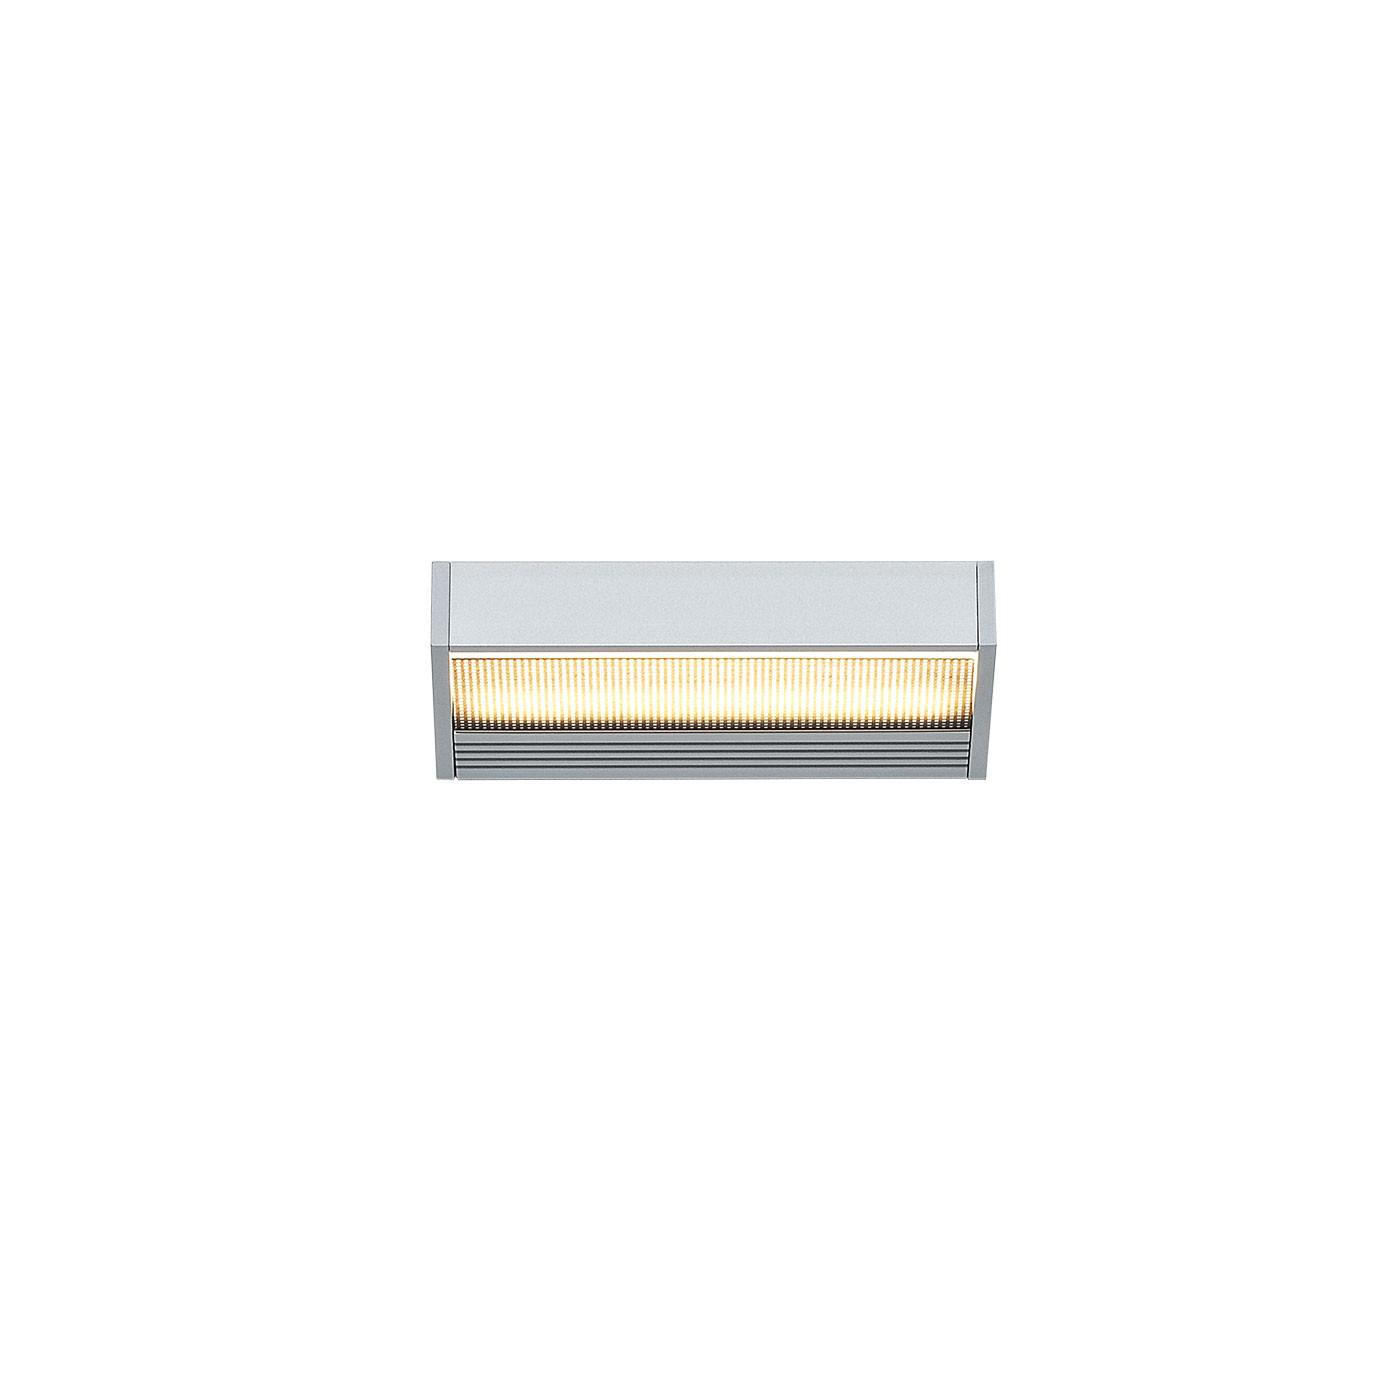 Serien Lighting SML² Wall 150, 3000K